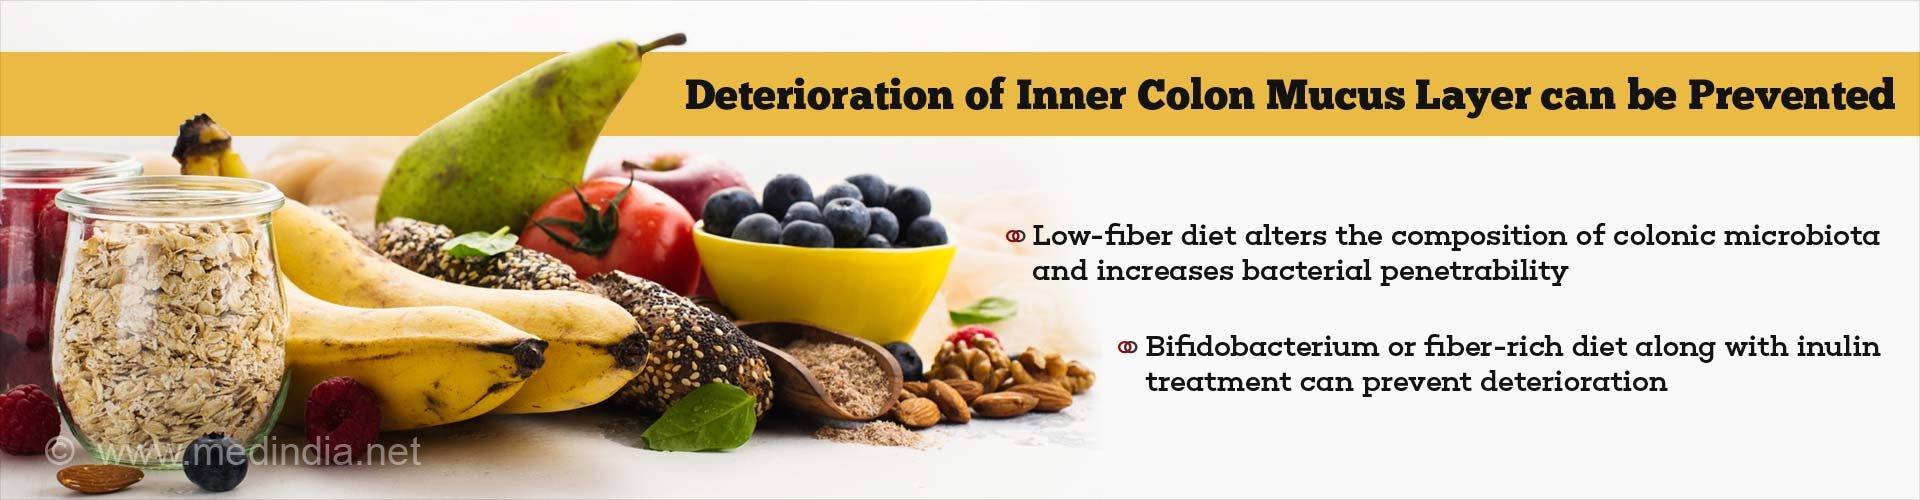 Fiber can Prevent Deterioration of Inner Colon Mucus Layer